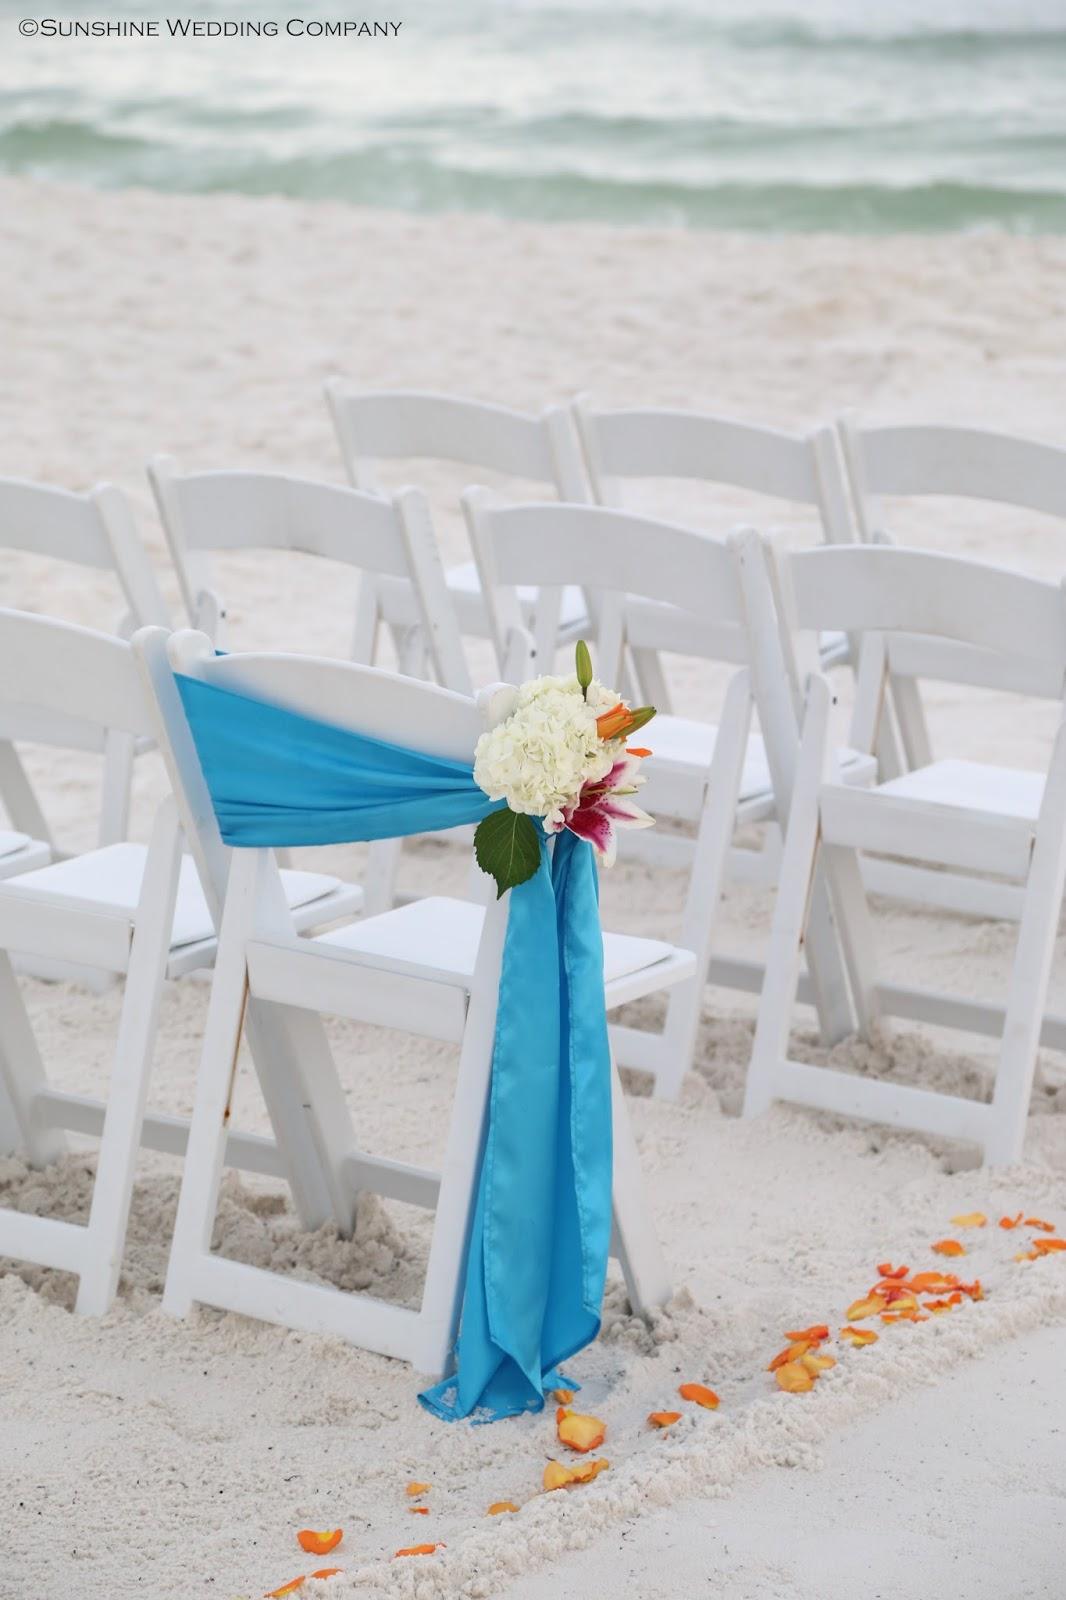 Wedding Flower Packages Sunshine Coast : Sunshine wedding company destin beach weddings